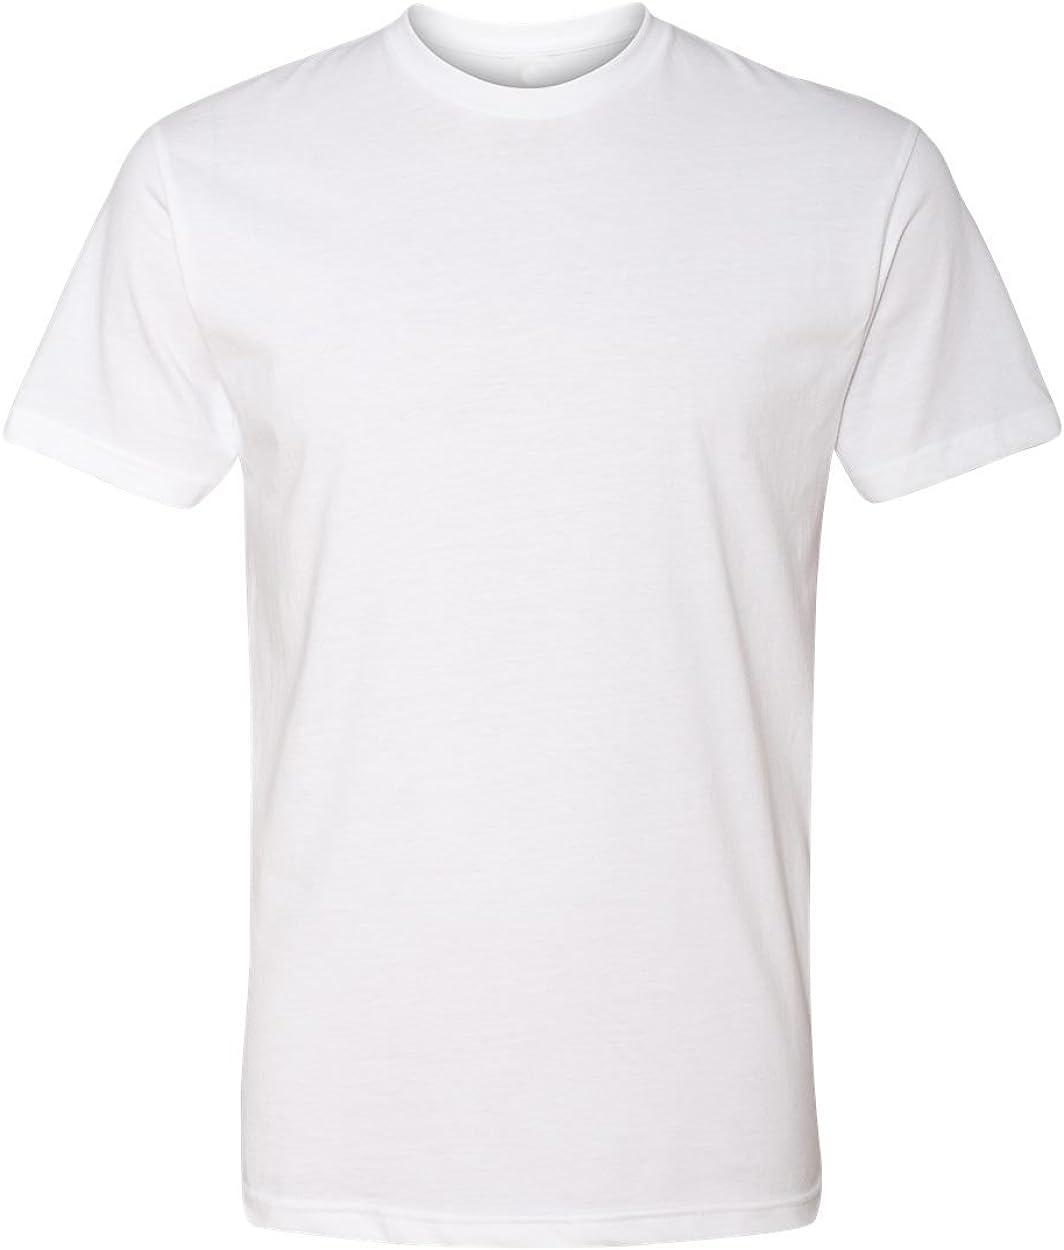 KAMAL OHAVA Men's Premium Slim Fit Crewneck T-Shirt